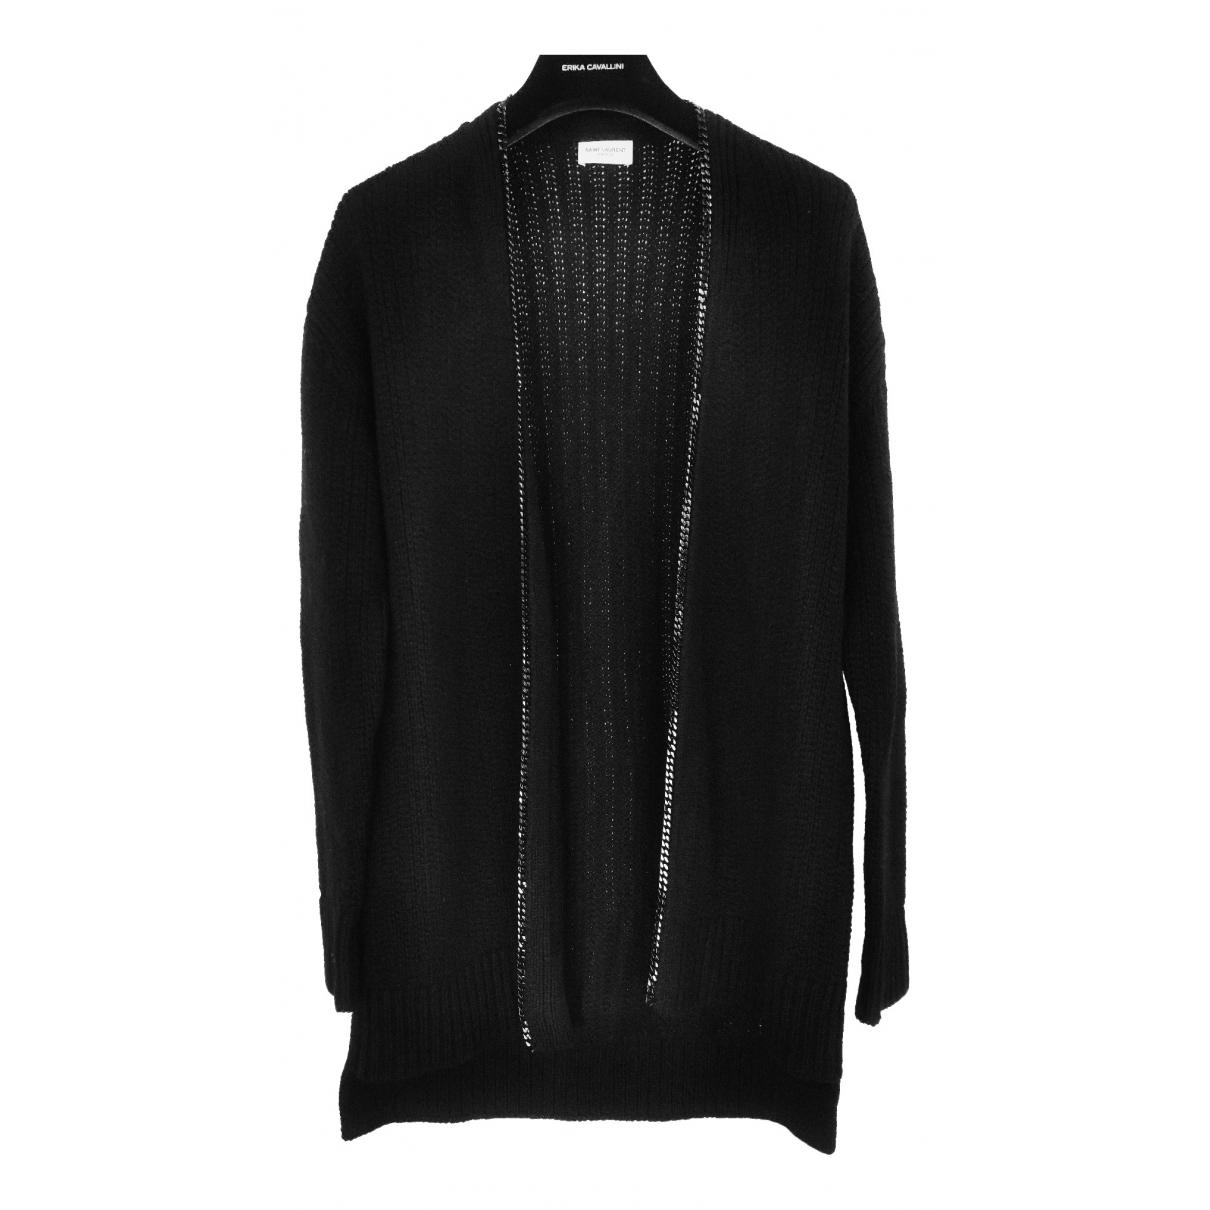 Saint Laurent \N Black Wool Knitwear & Sweatshirts for Men S International